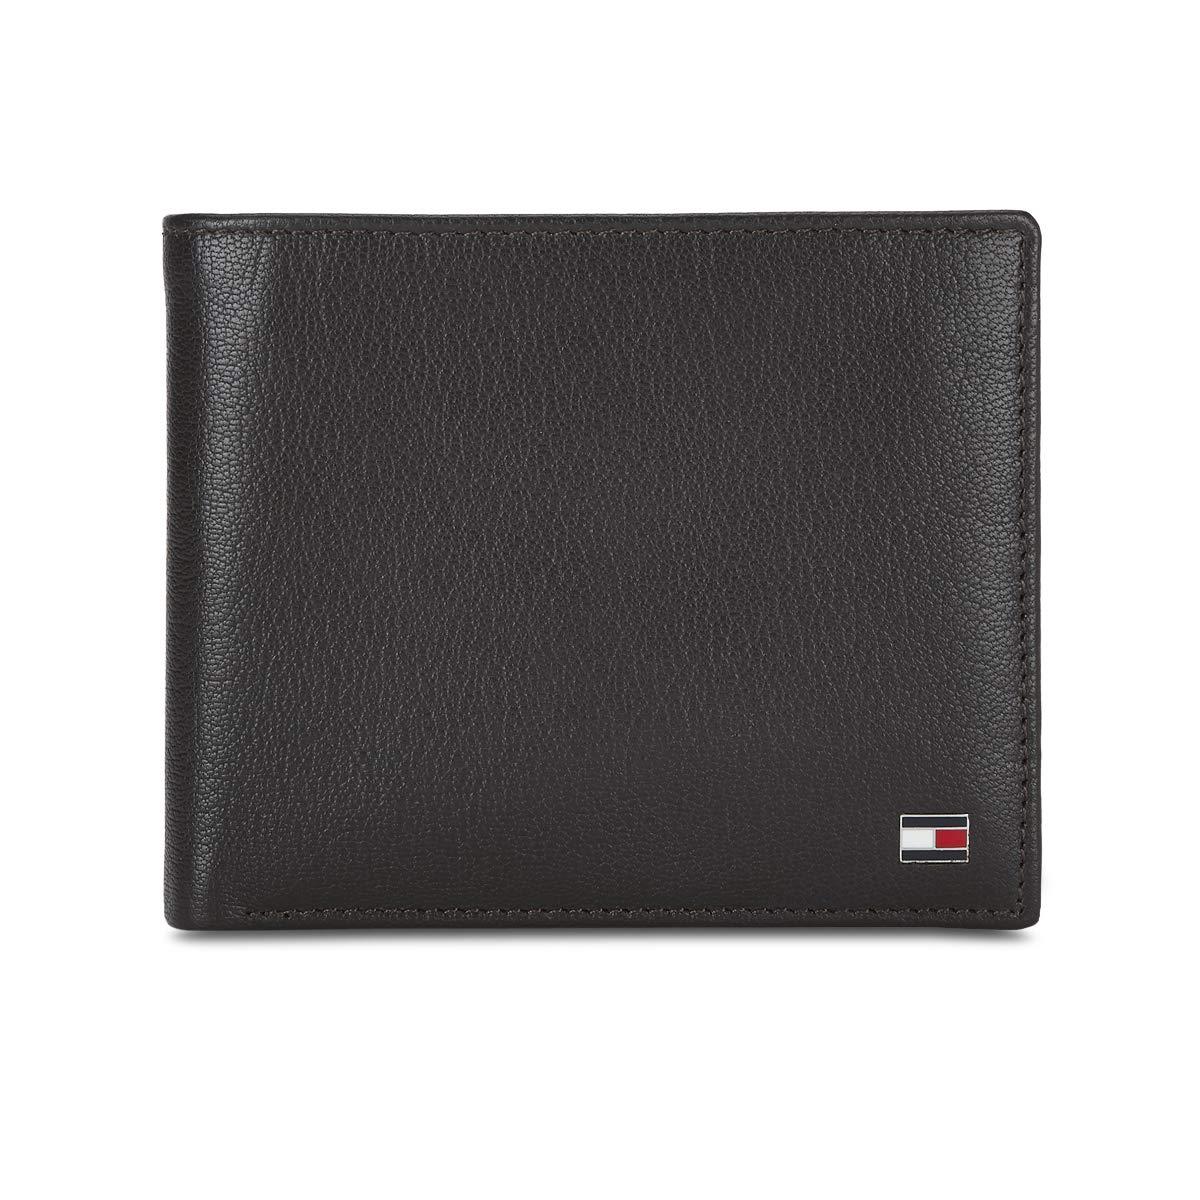 Tommy Hilfiger Brown Leather Men's Wallet  8903496150391  Wallets